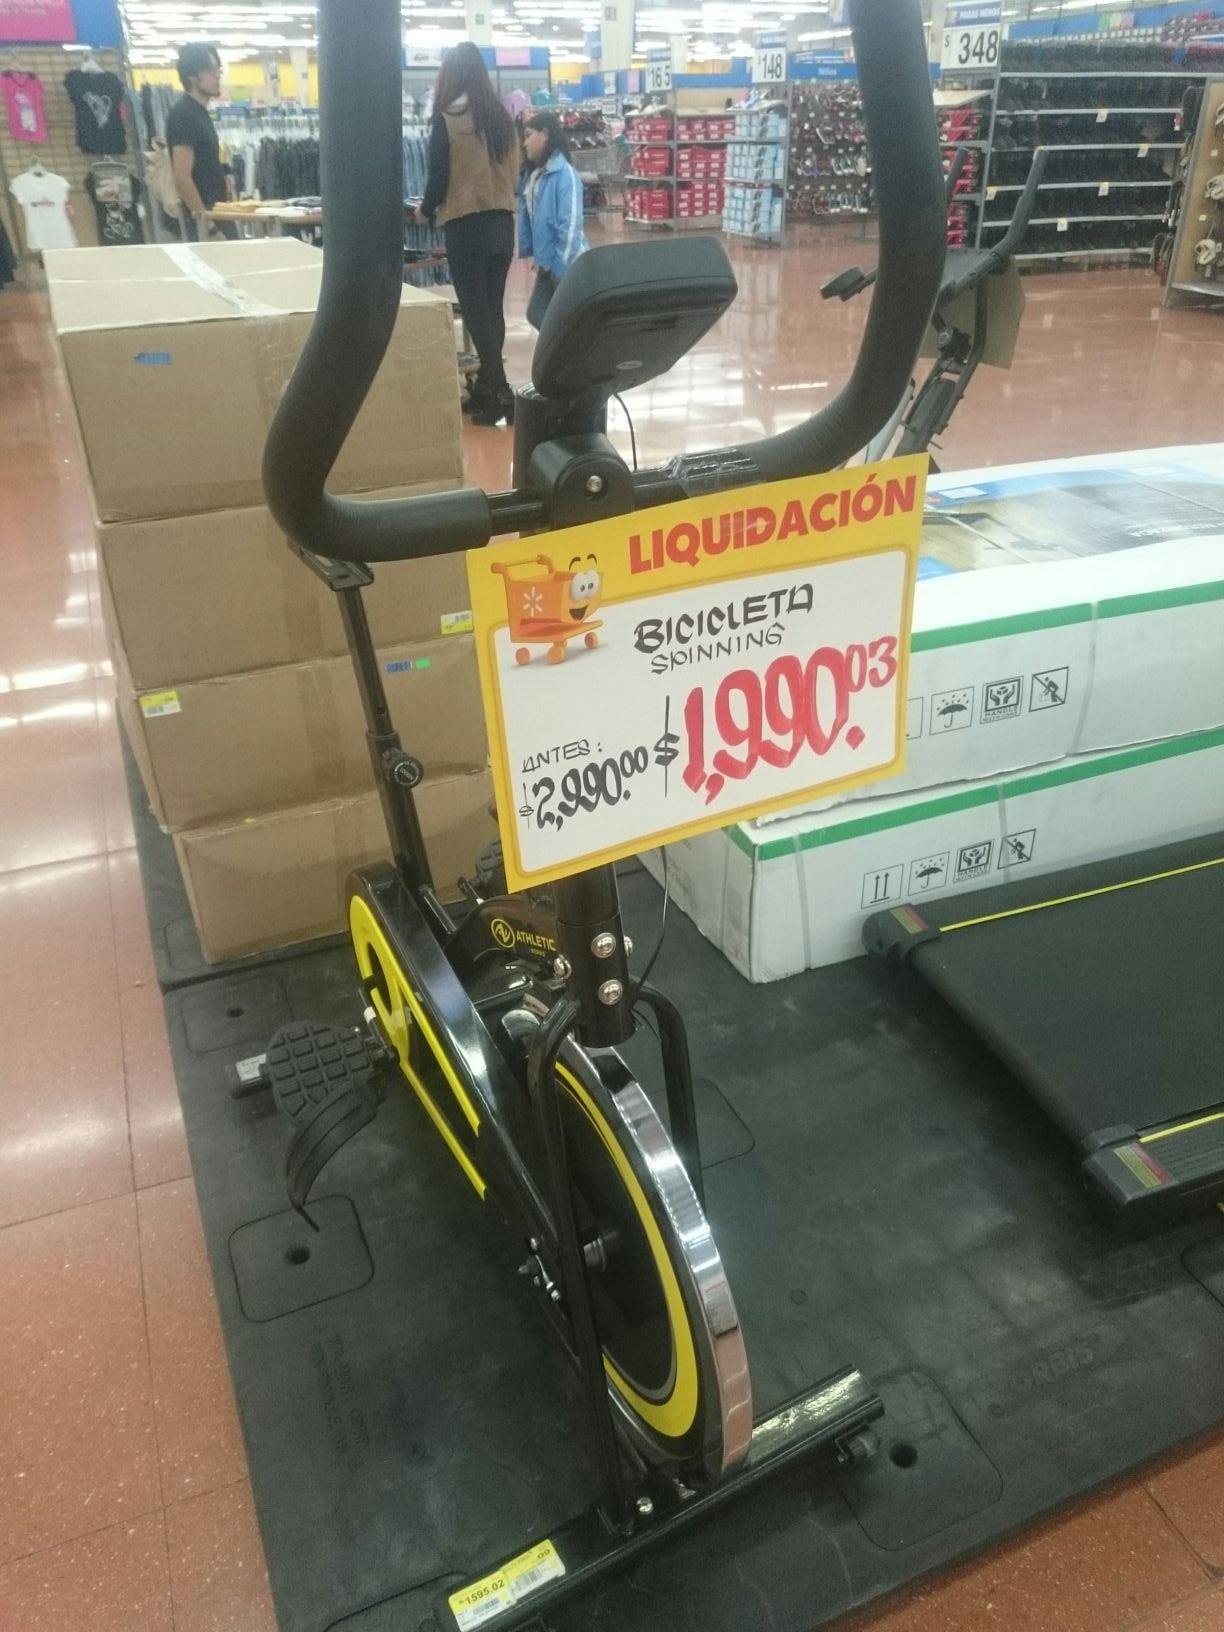 Walmart: Bicicleta Spinning a $1,990.03